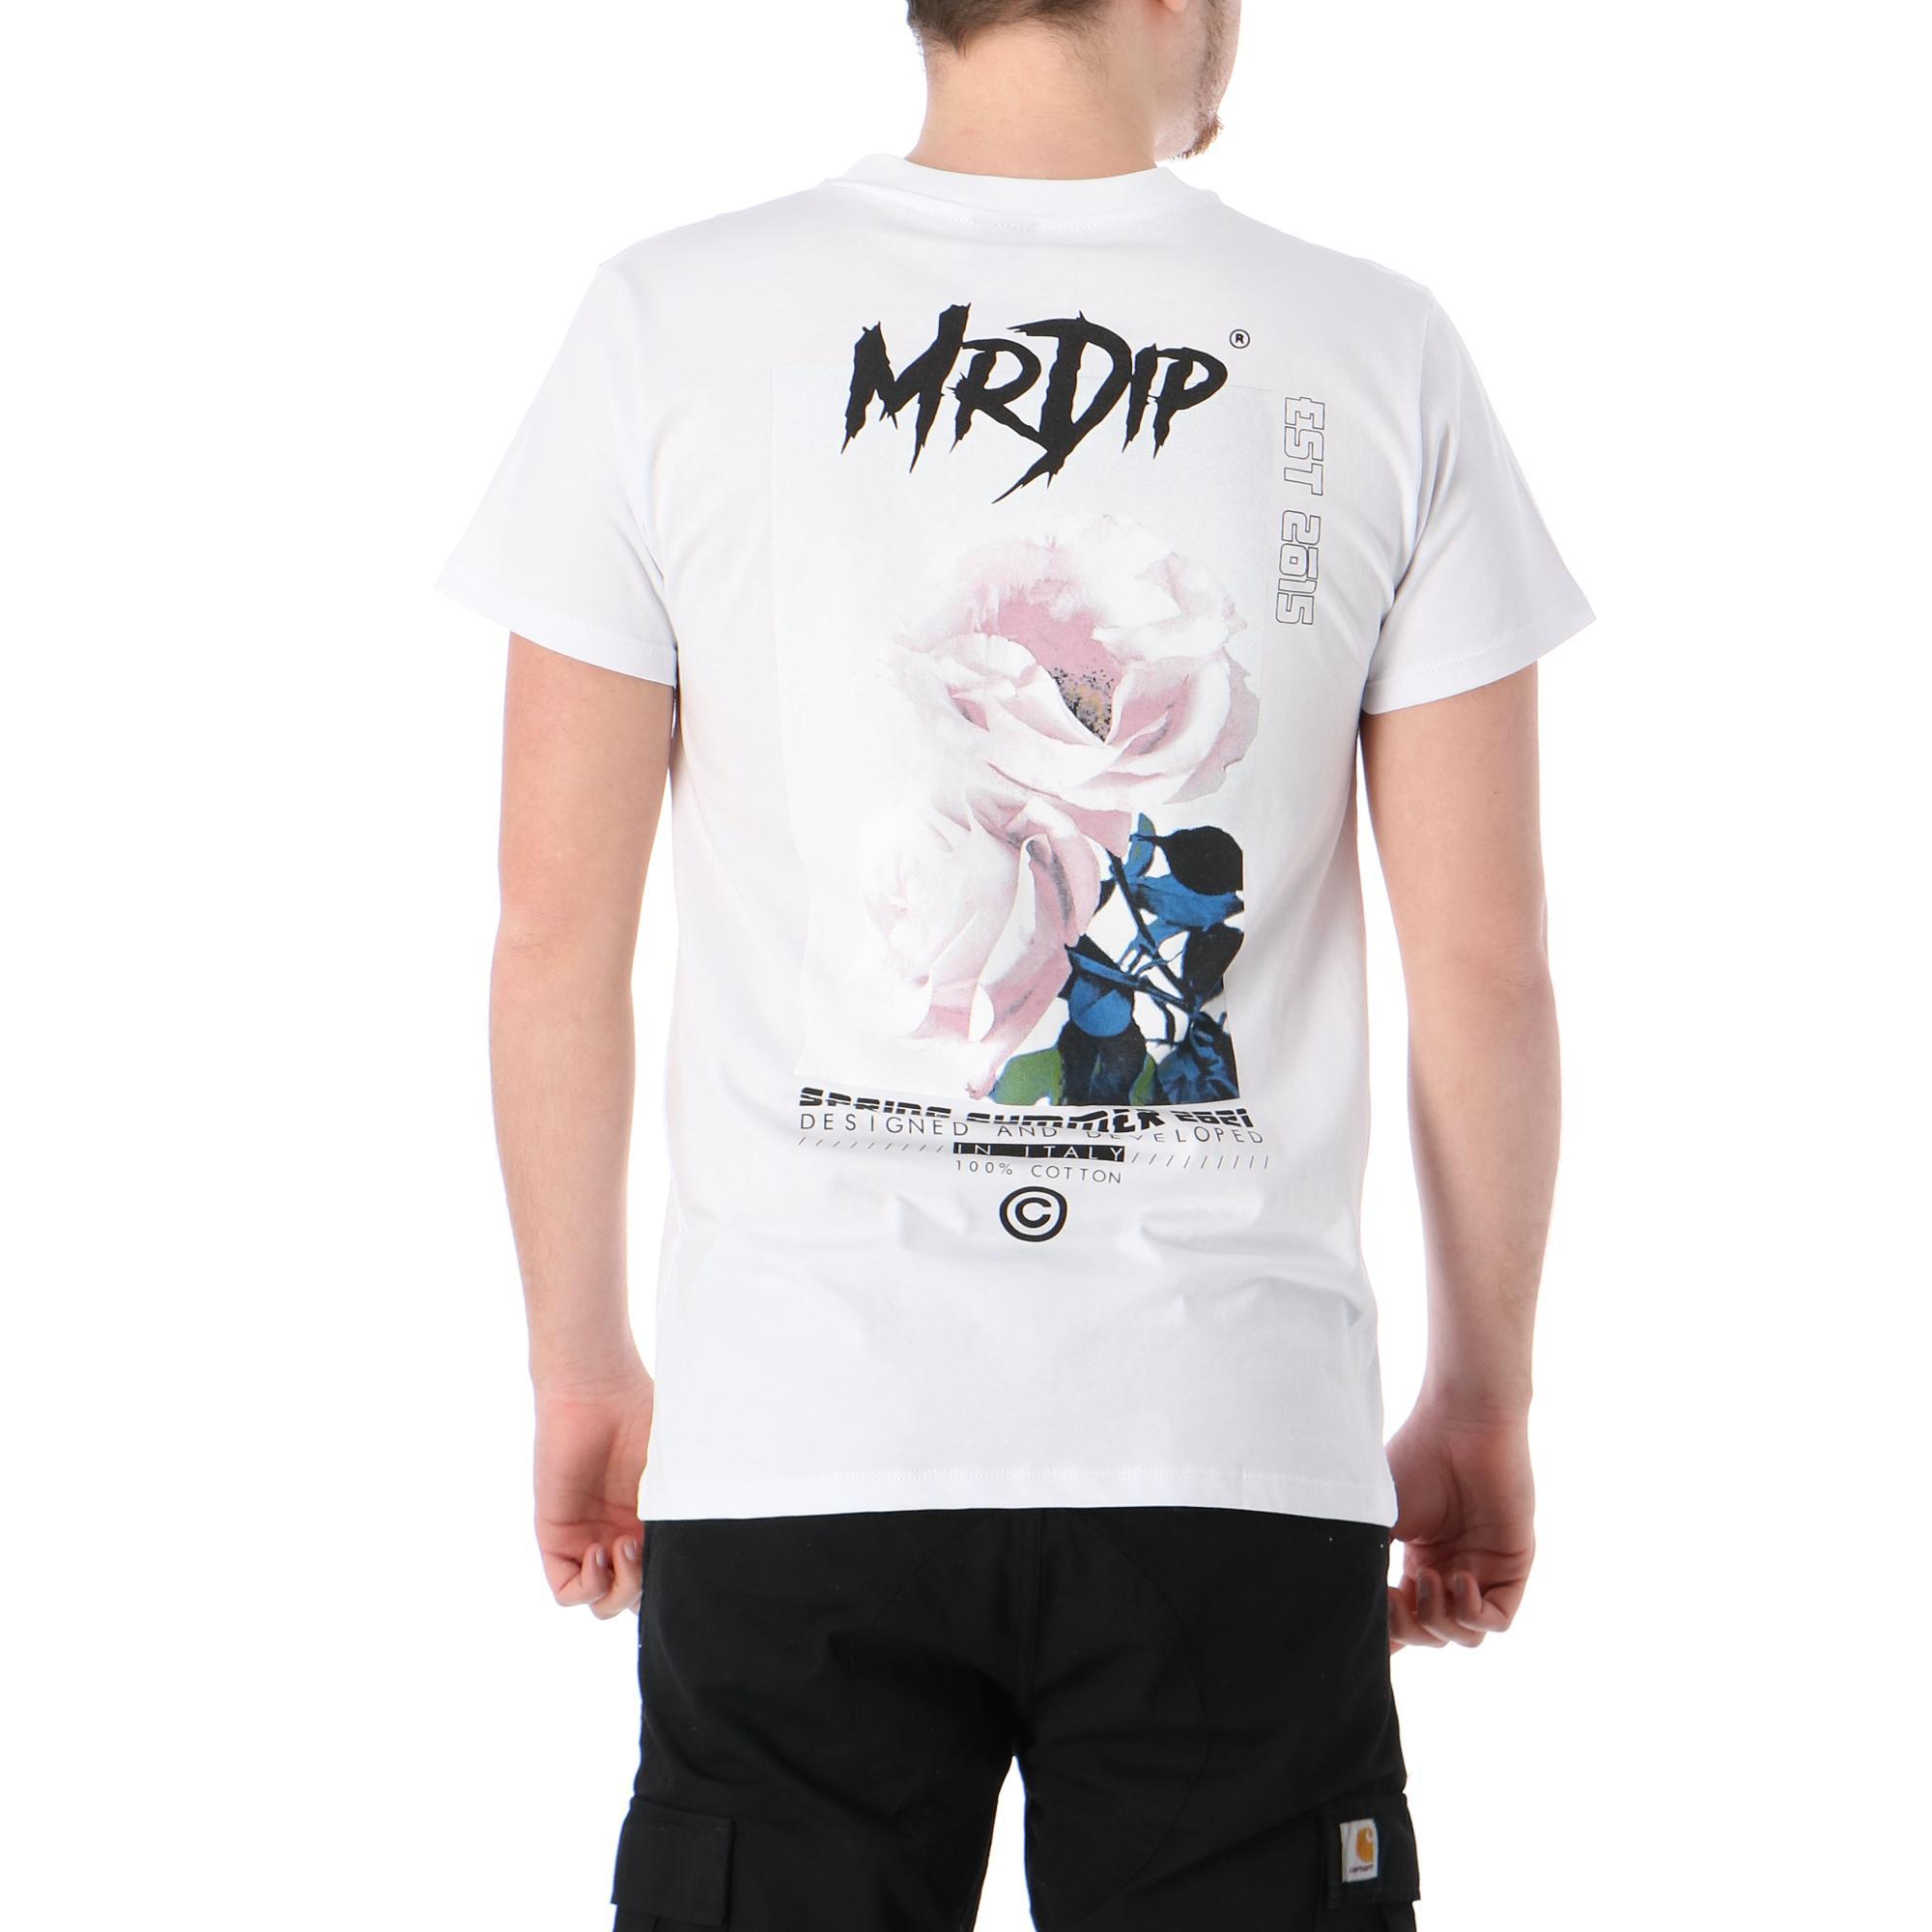 Mrdip Flowers Tee White black